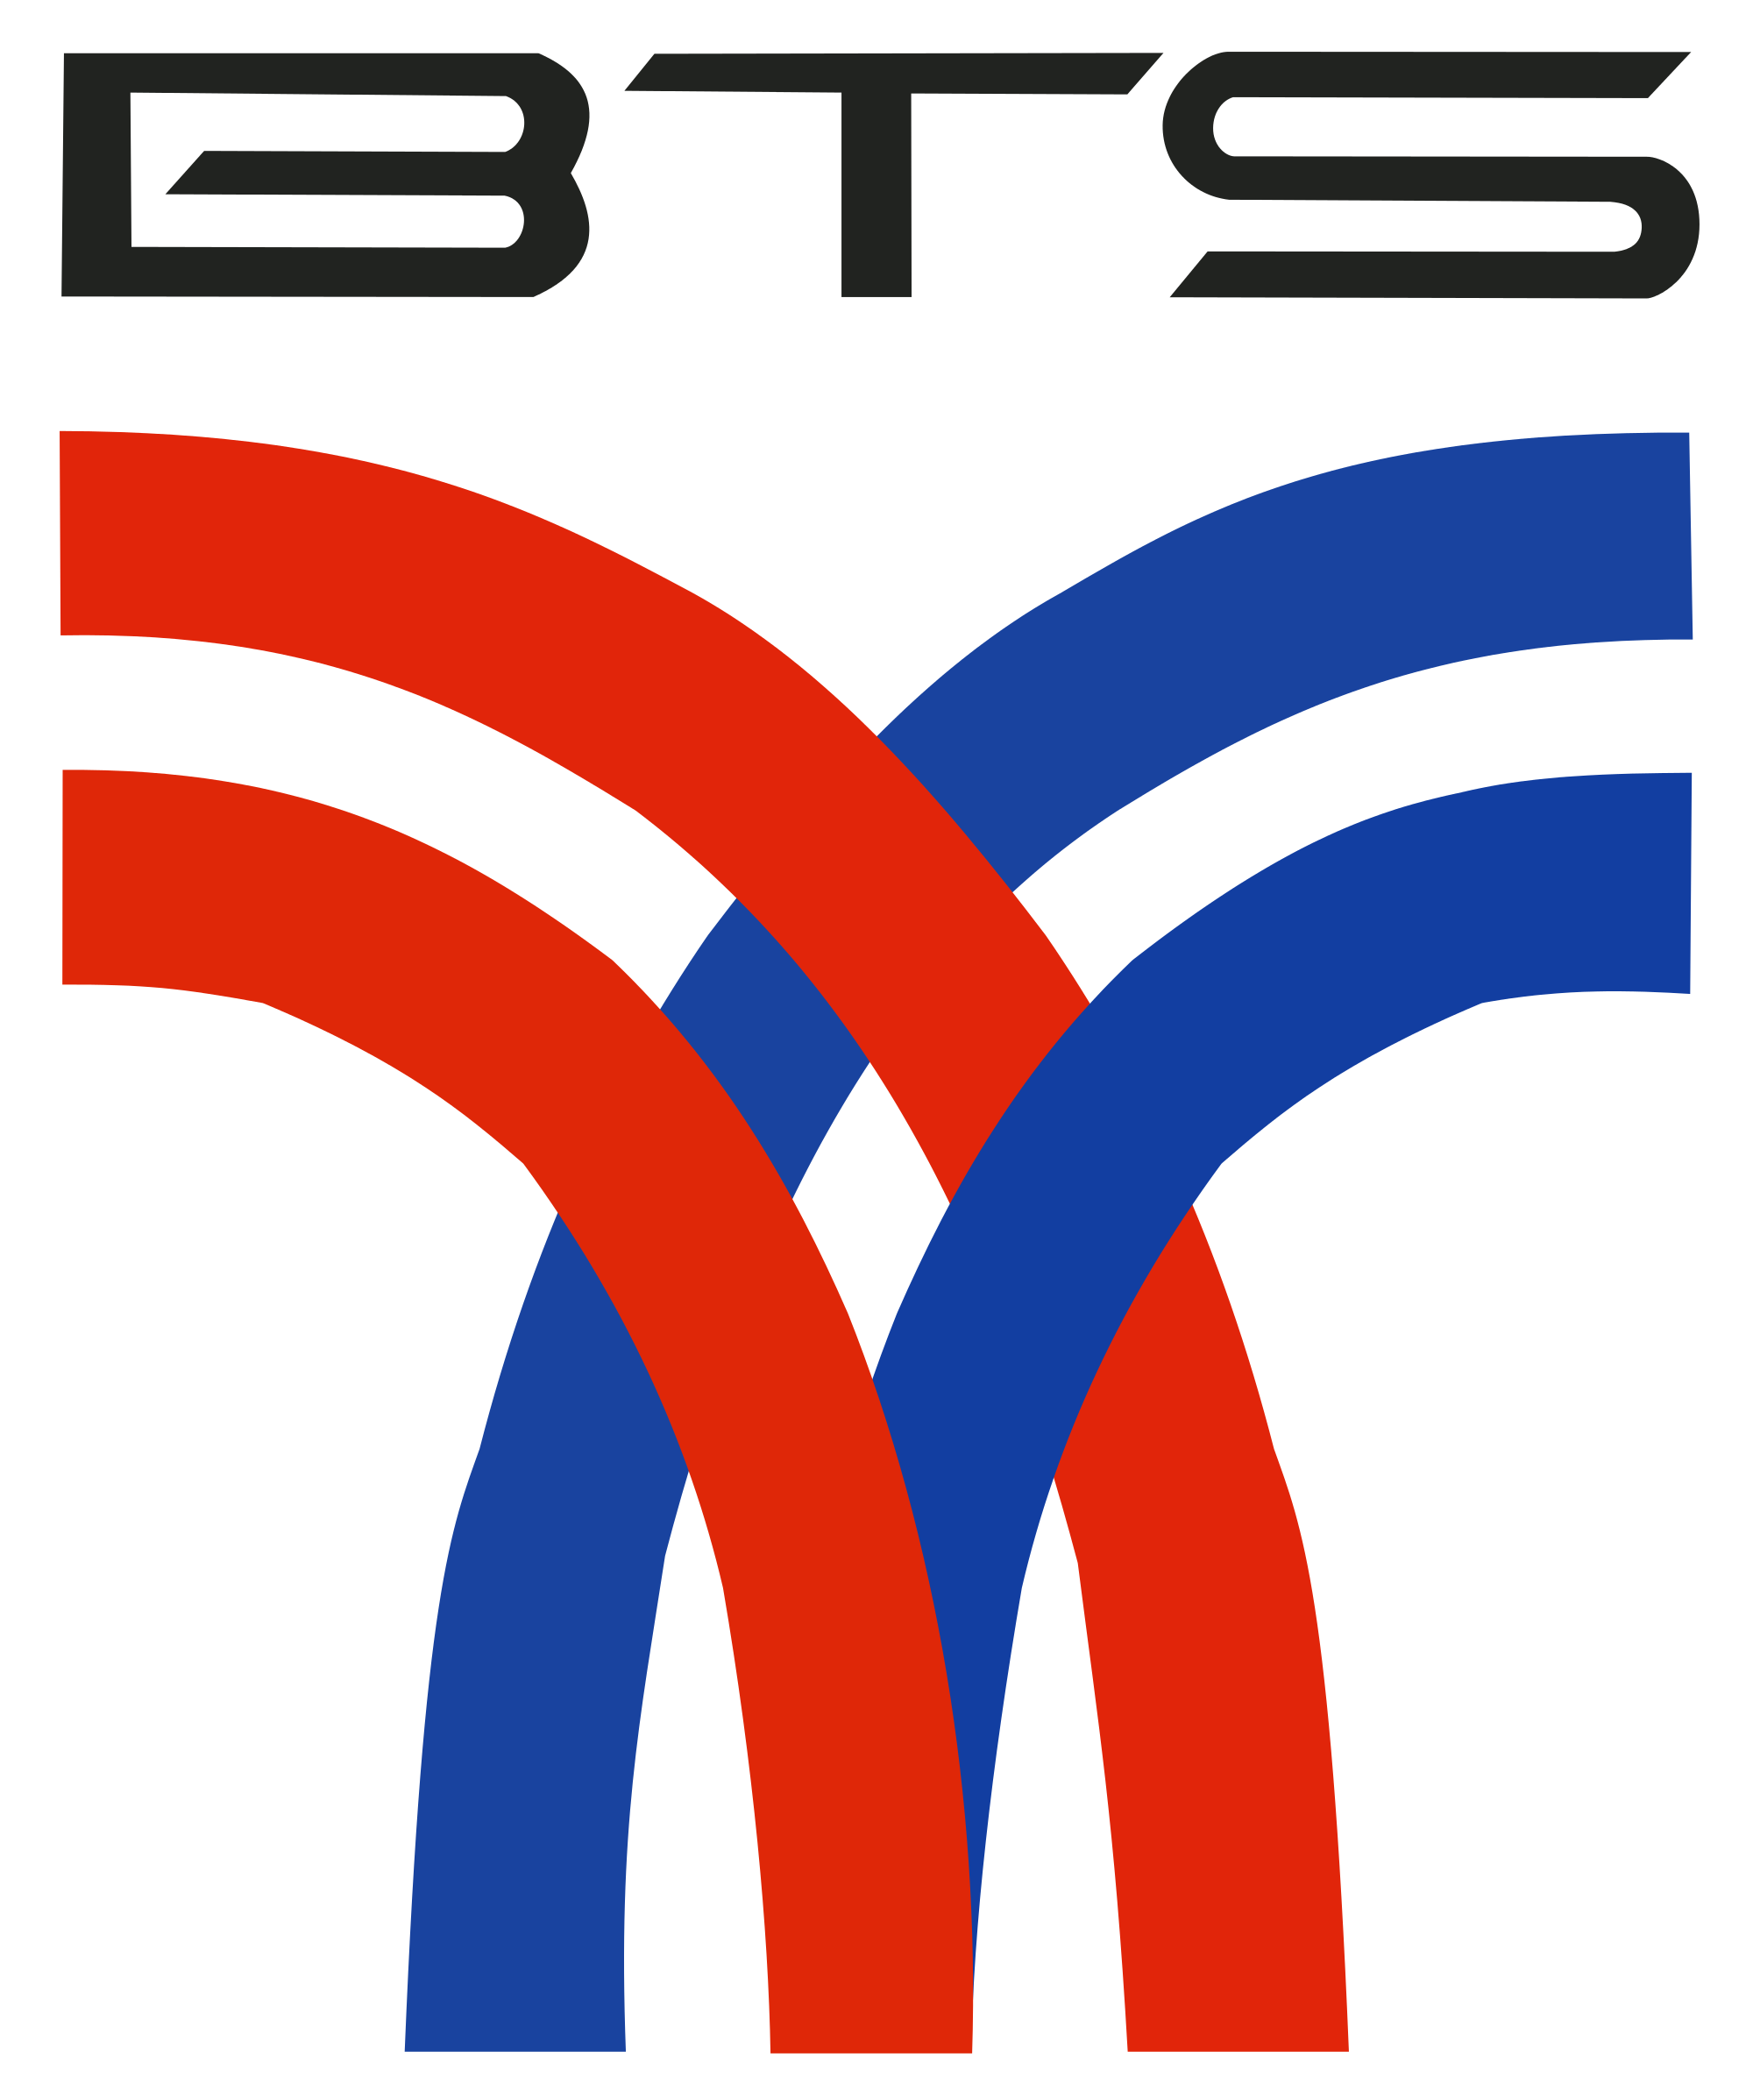 2000pxBTSLogo.svg.png 2,000×2,396 ピクセル Logo Design